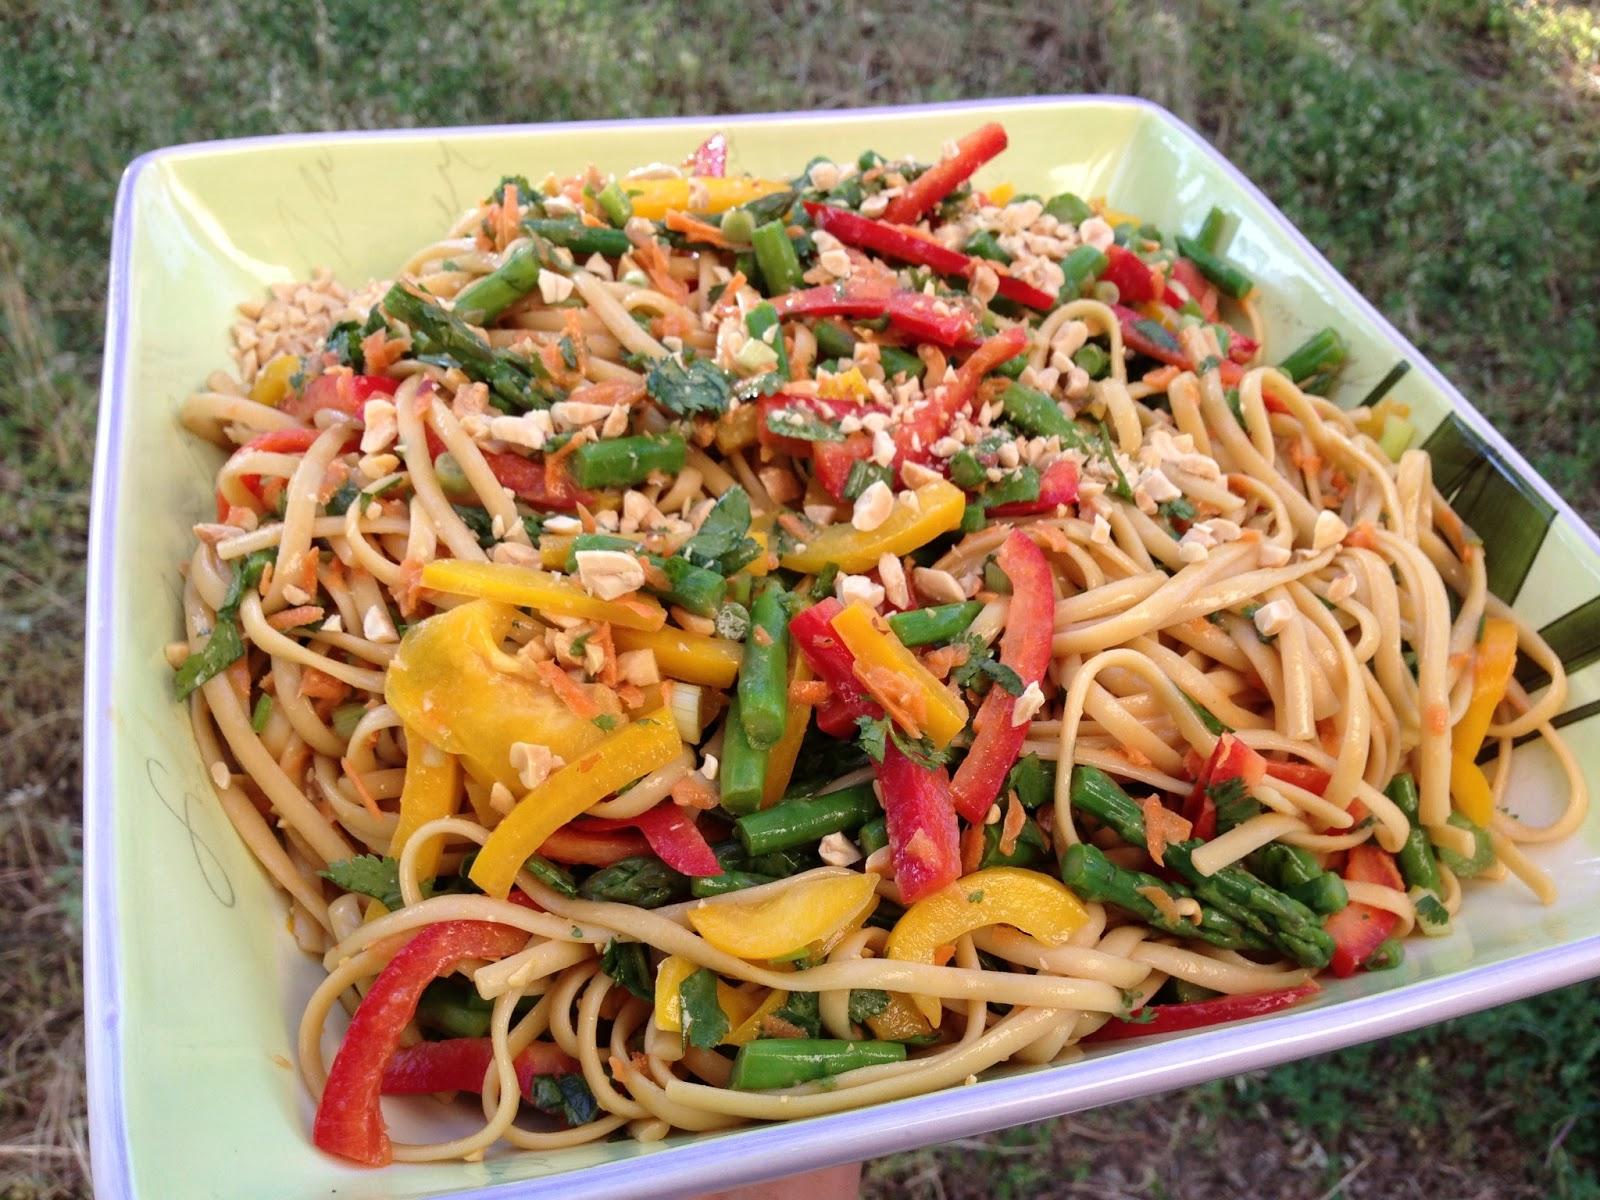 Spicy Thai Noodles With Shrimp Spicy Thai Noodles With Shrimp